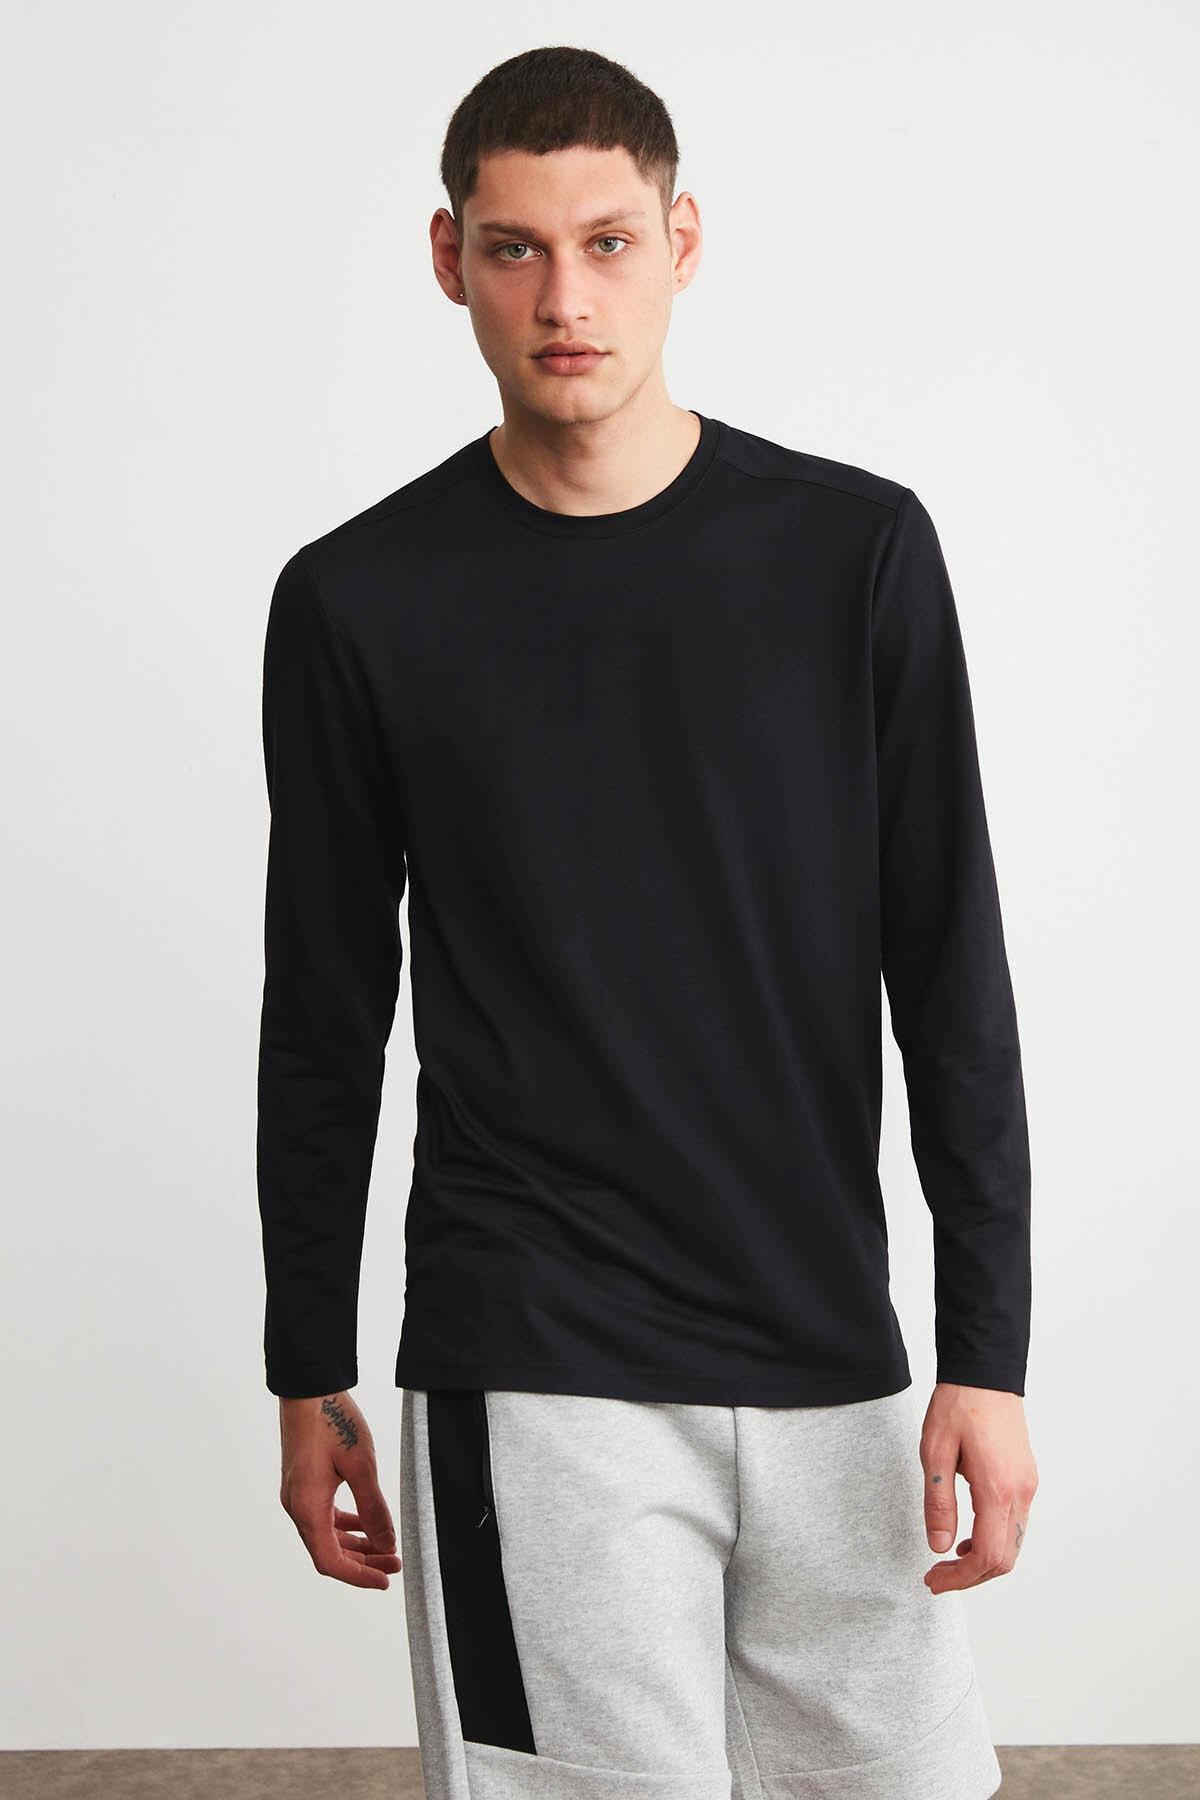 HUMMER Erkek Siyah Uzun Kollu Spor T-shirt